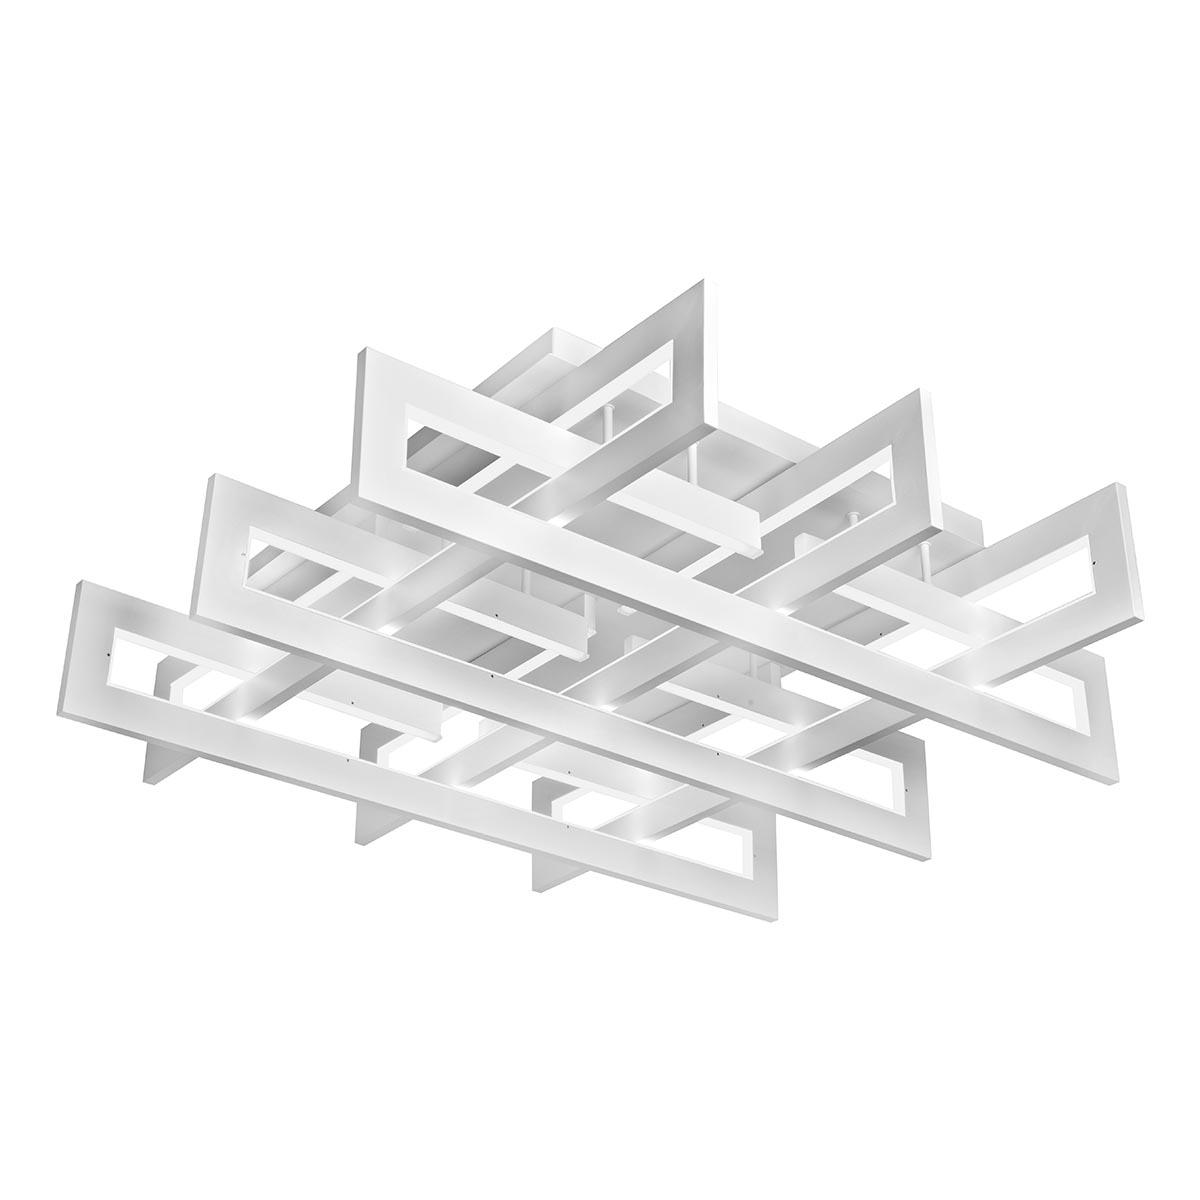 Светильник iLedex 9082-800*800-X 192W WH Stalker